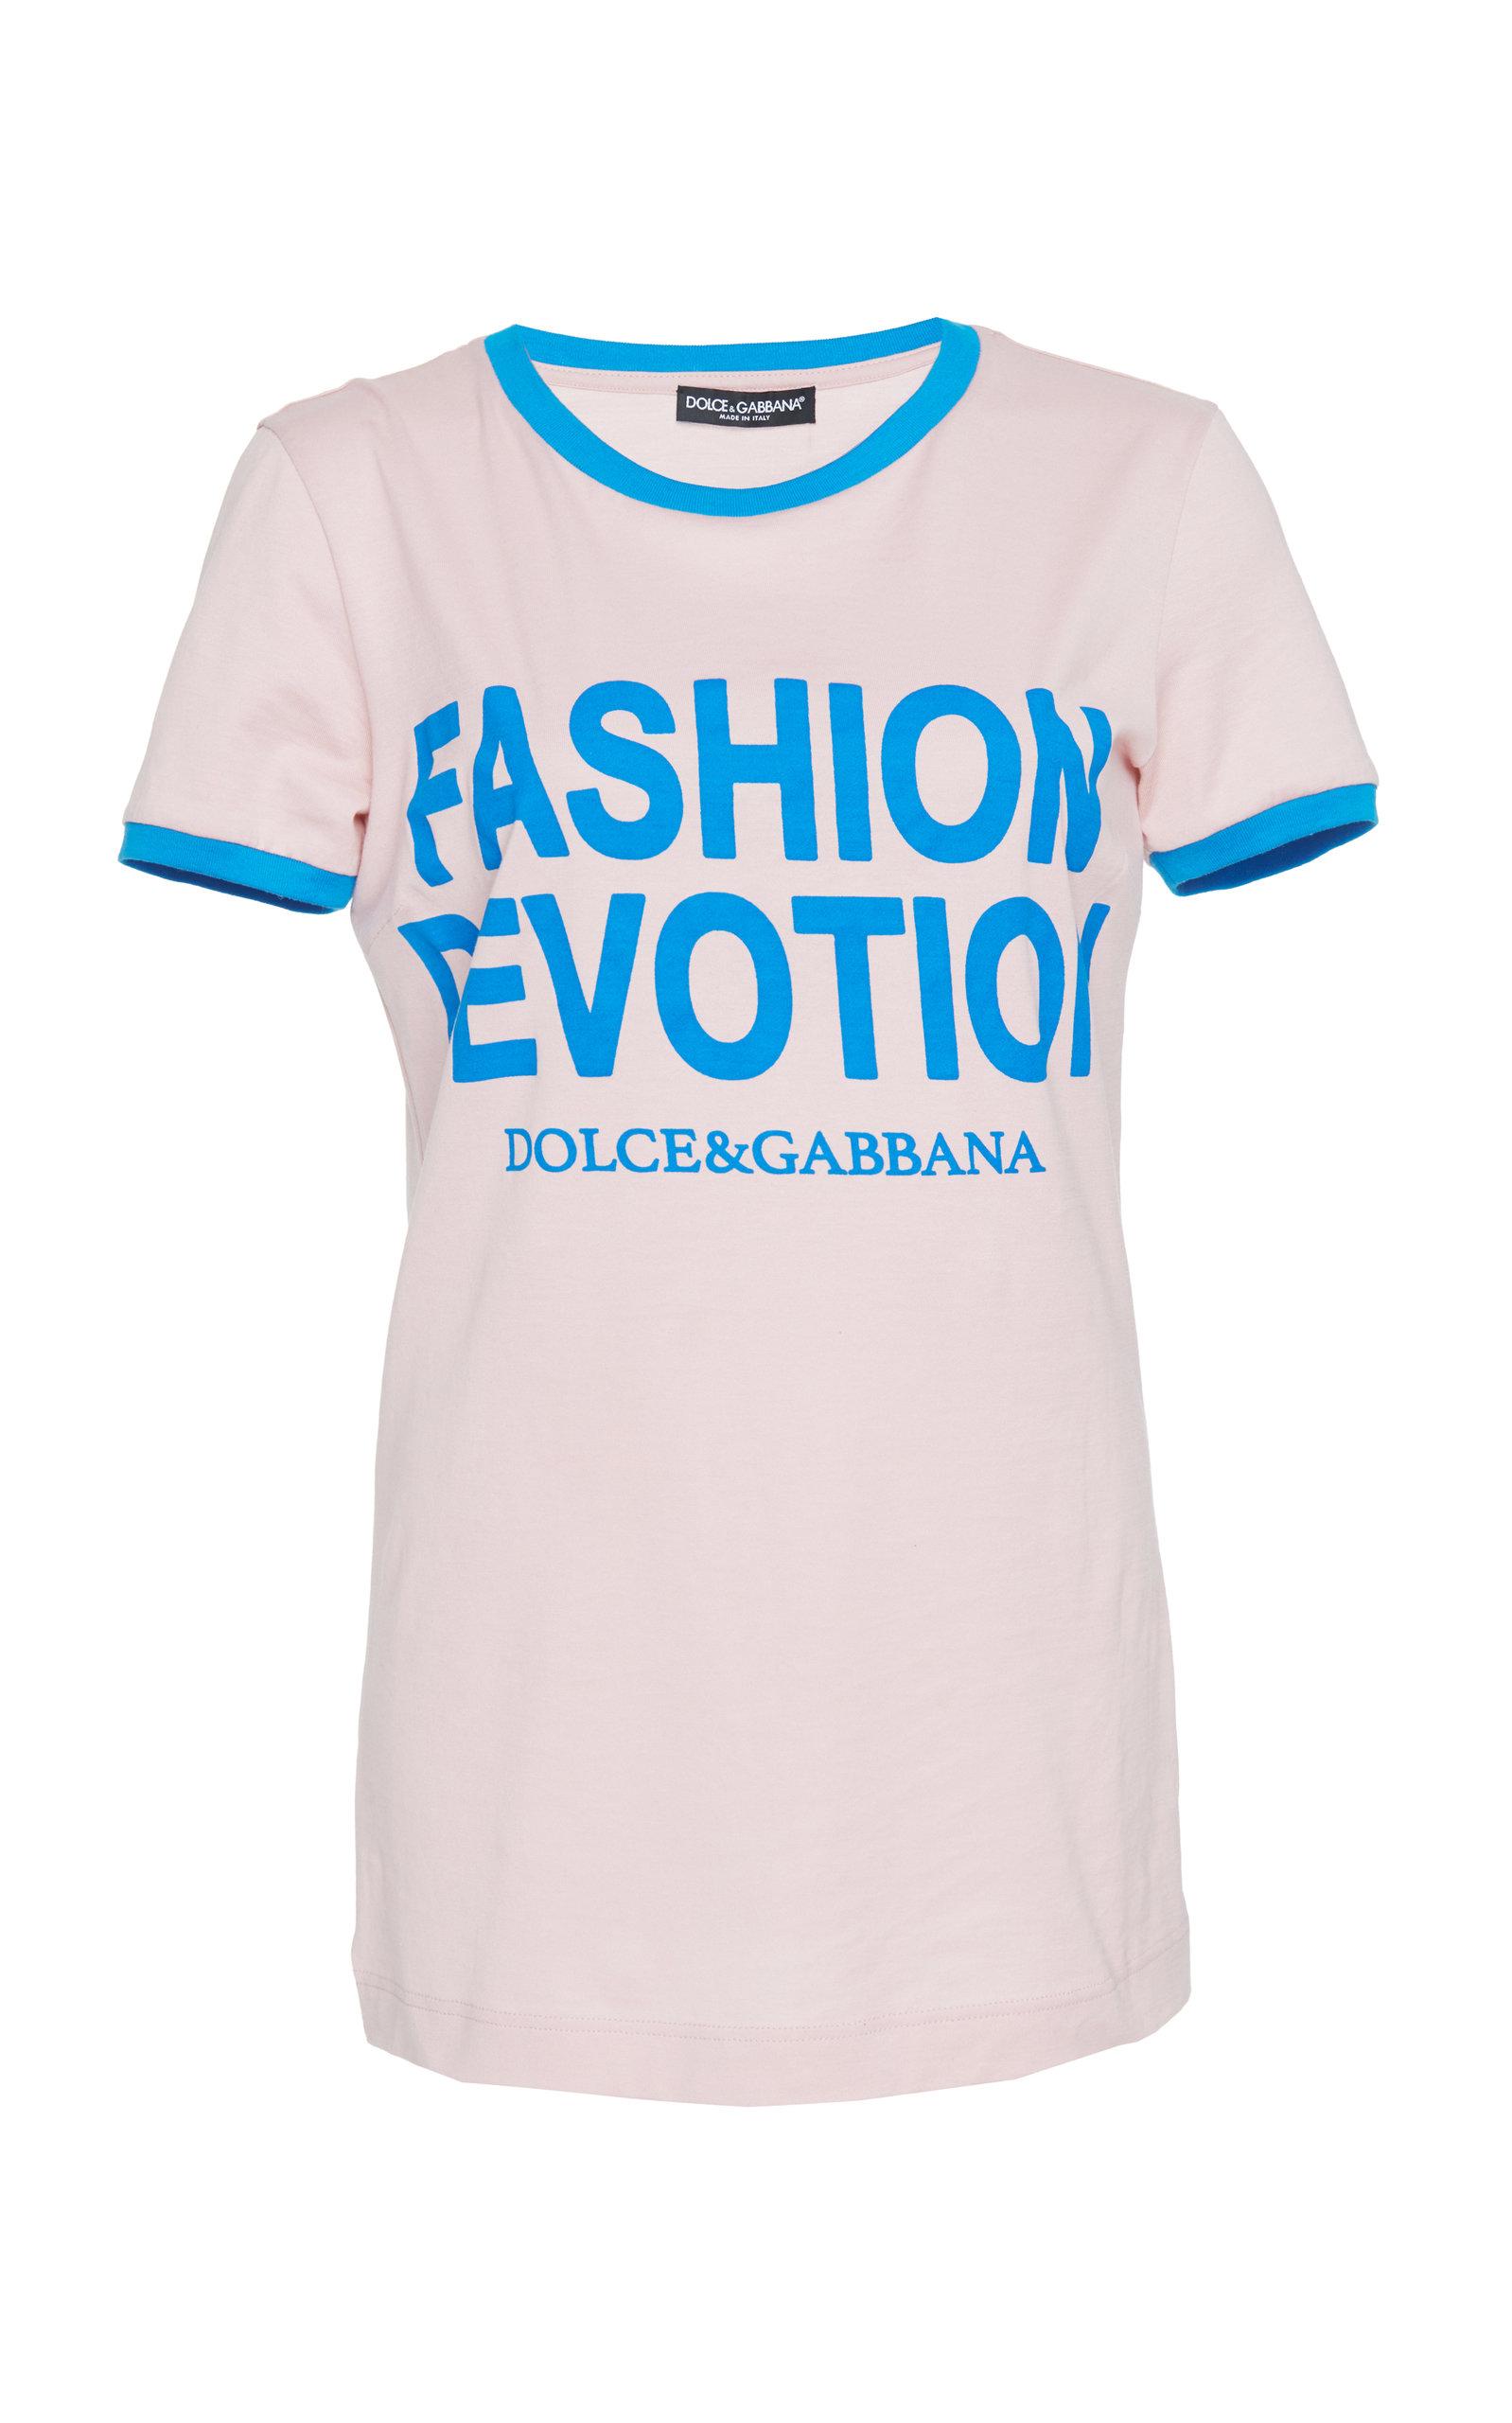 Fashion Devotion Printed Jersey T-Shirt, Pink